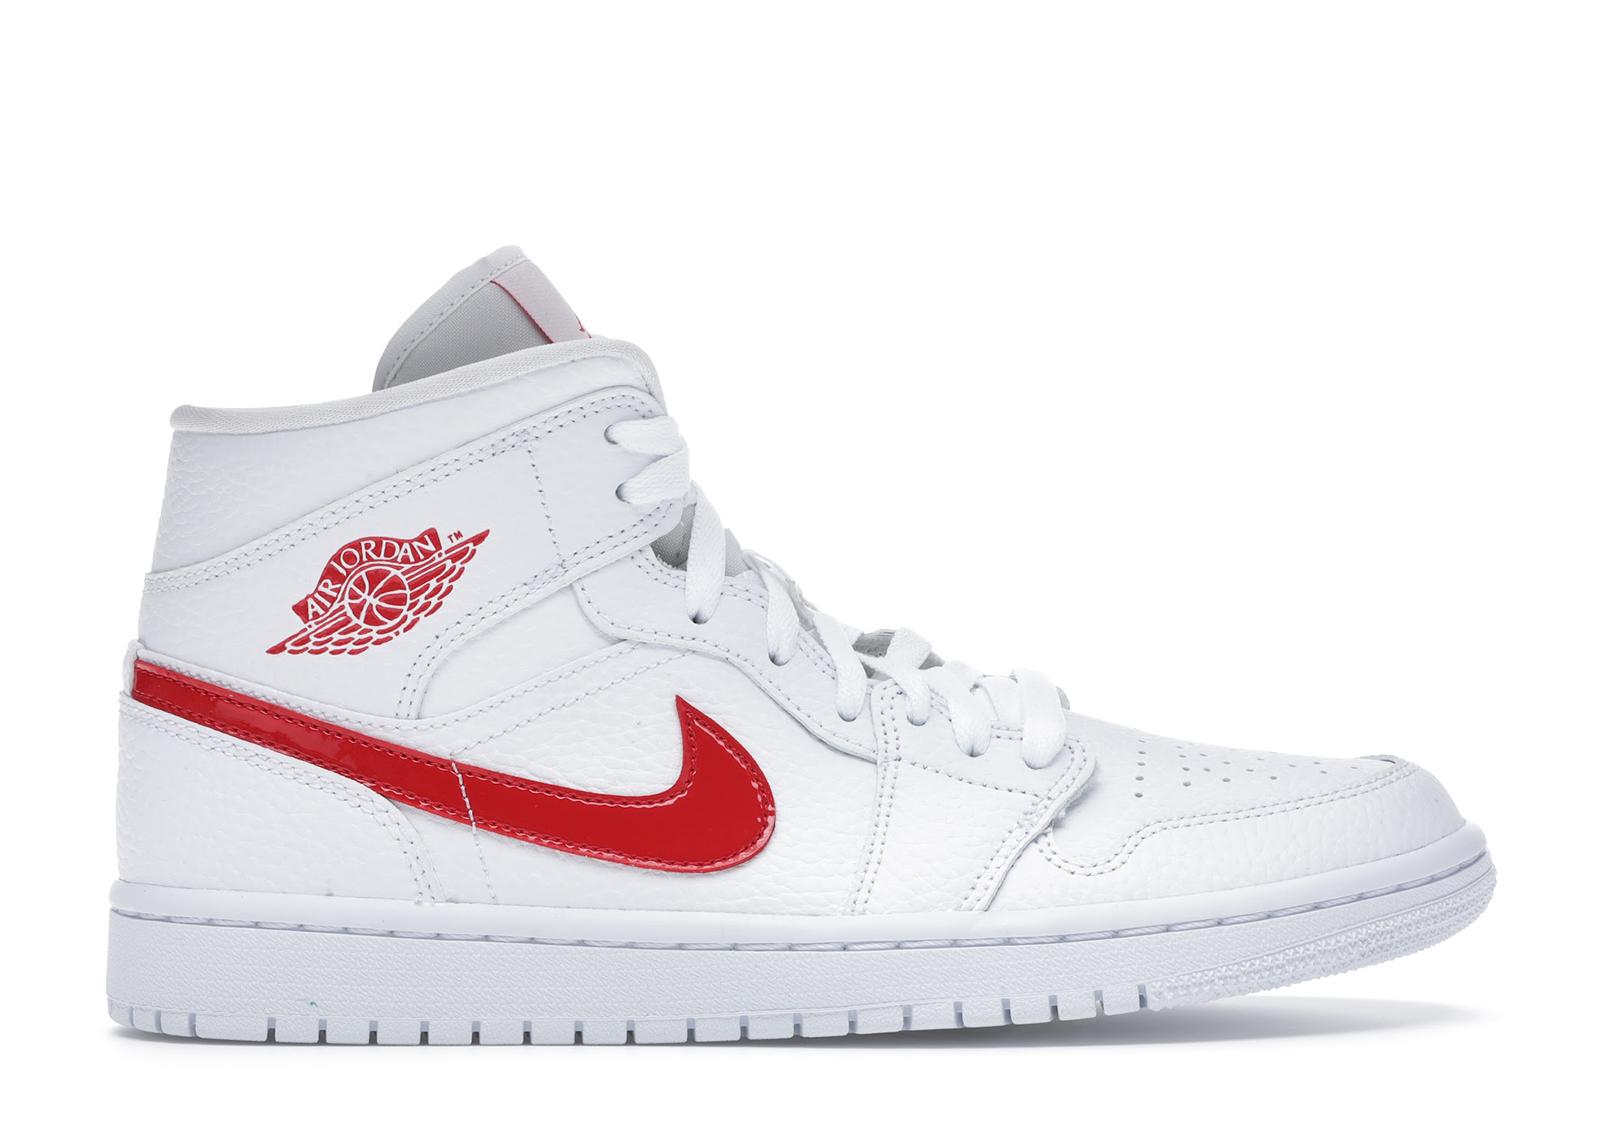 Jordan 1 Mid White University Red (W) - BQ6472-106